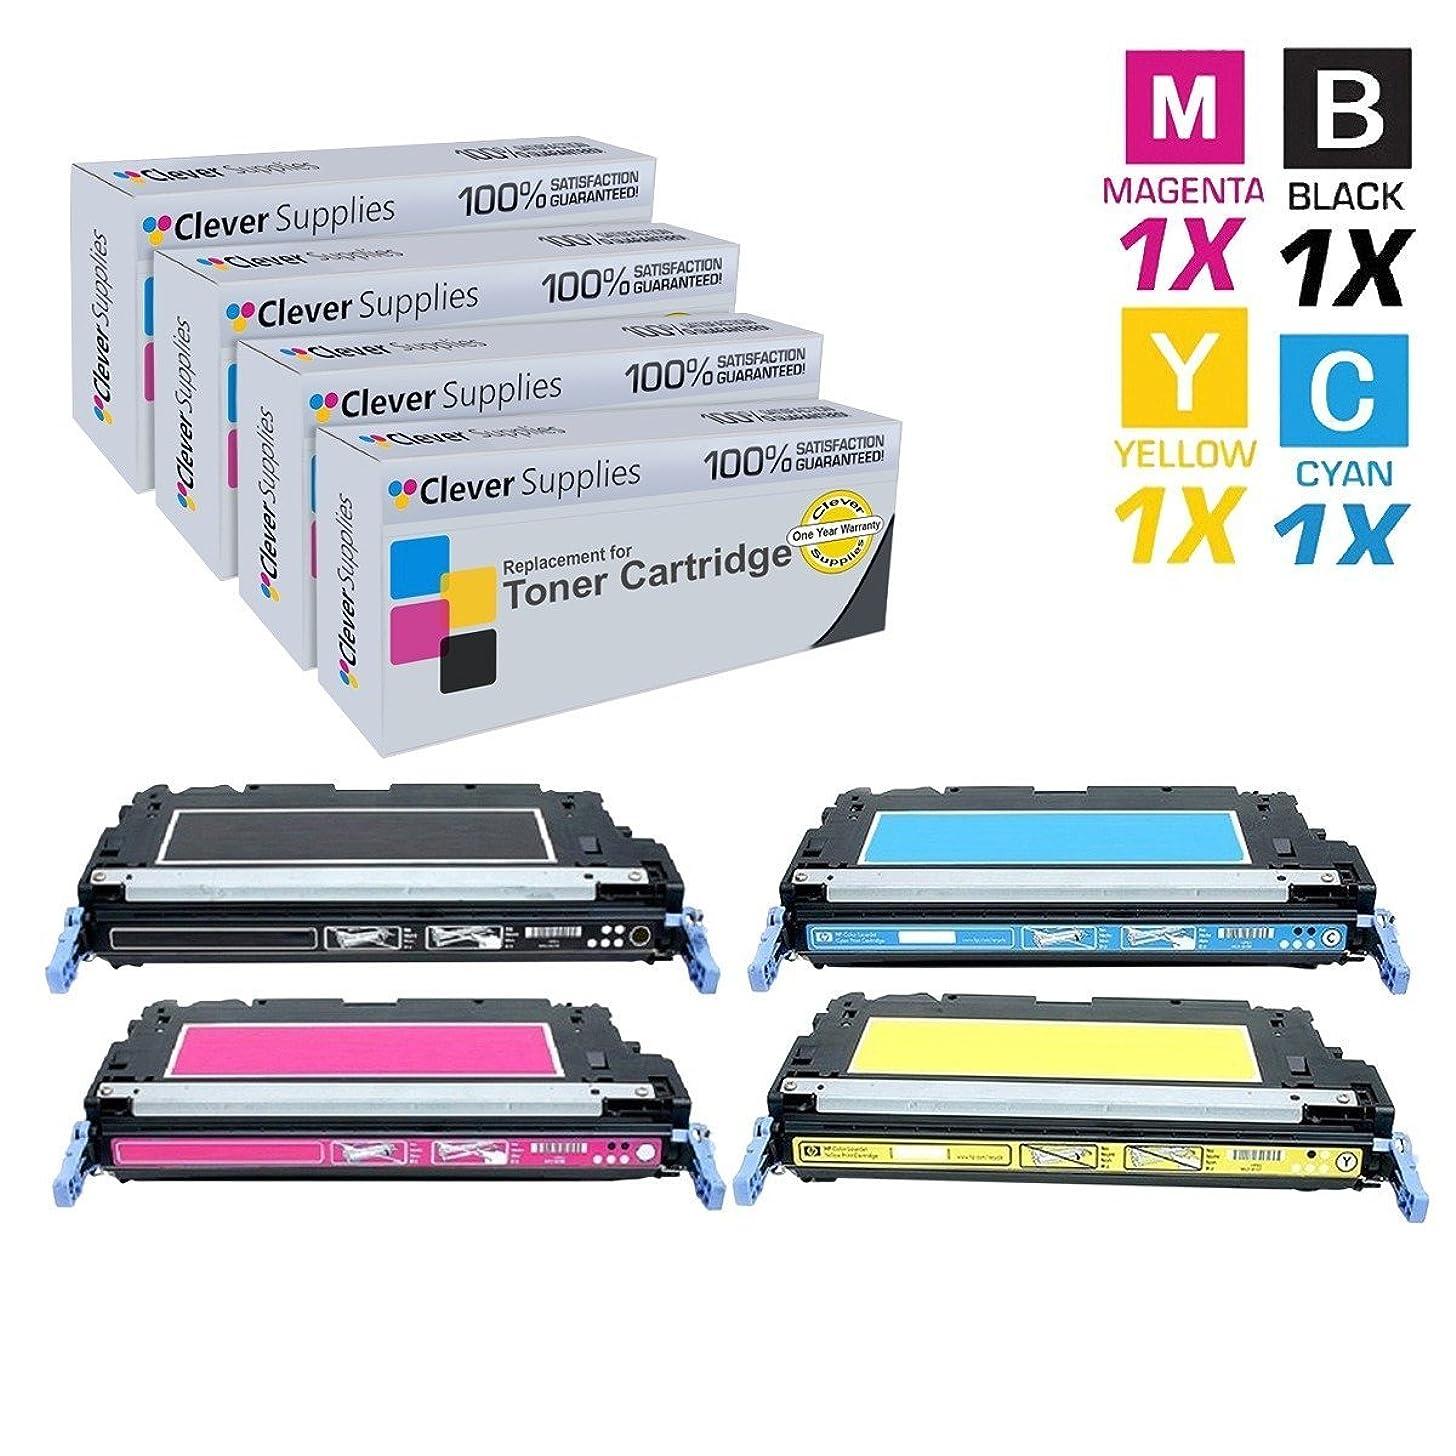 CS Compatible Toner Cartridge Replacement for HP 3800DN Q6470A Black Q7581A Cyan Q7582A Yellow Q7583A Magenta HP 502A & HP 503A Color Laserjet 3600n 3600dn 3800dn 3800dtn CP3505n 4 Color Set